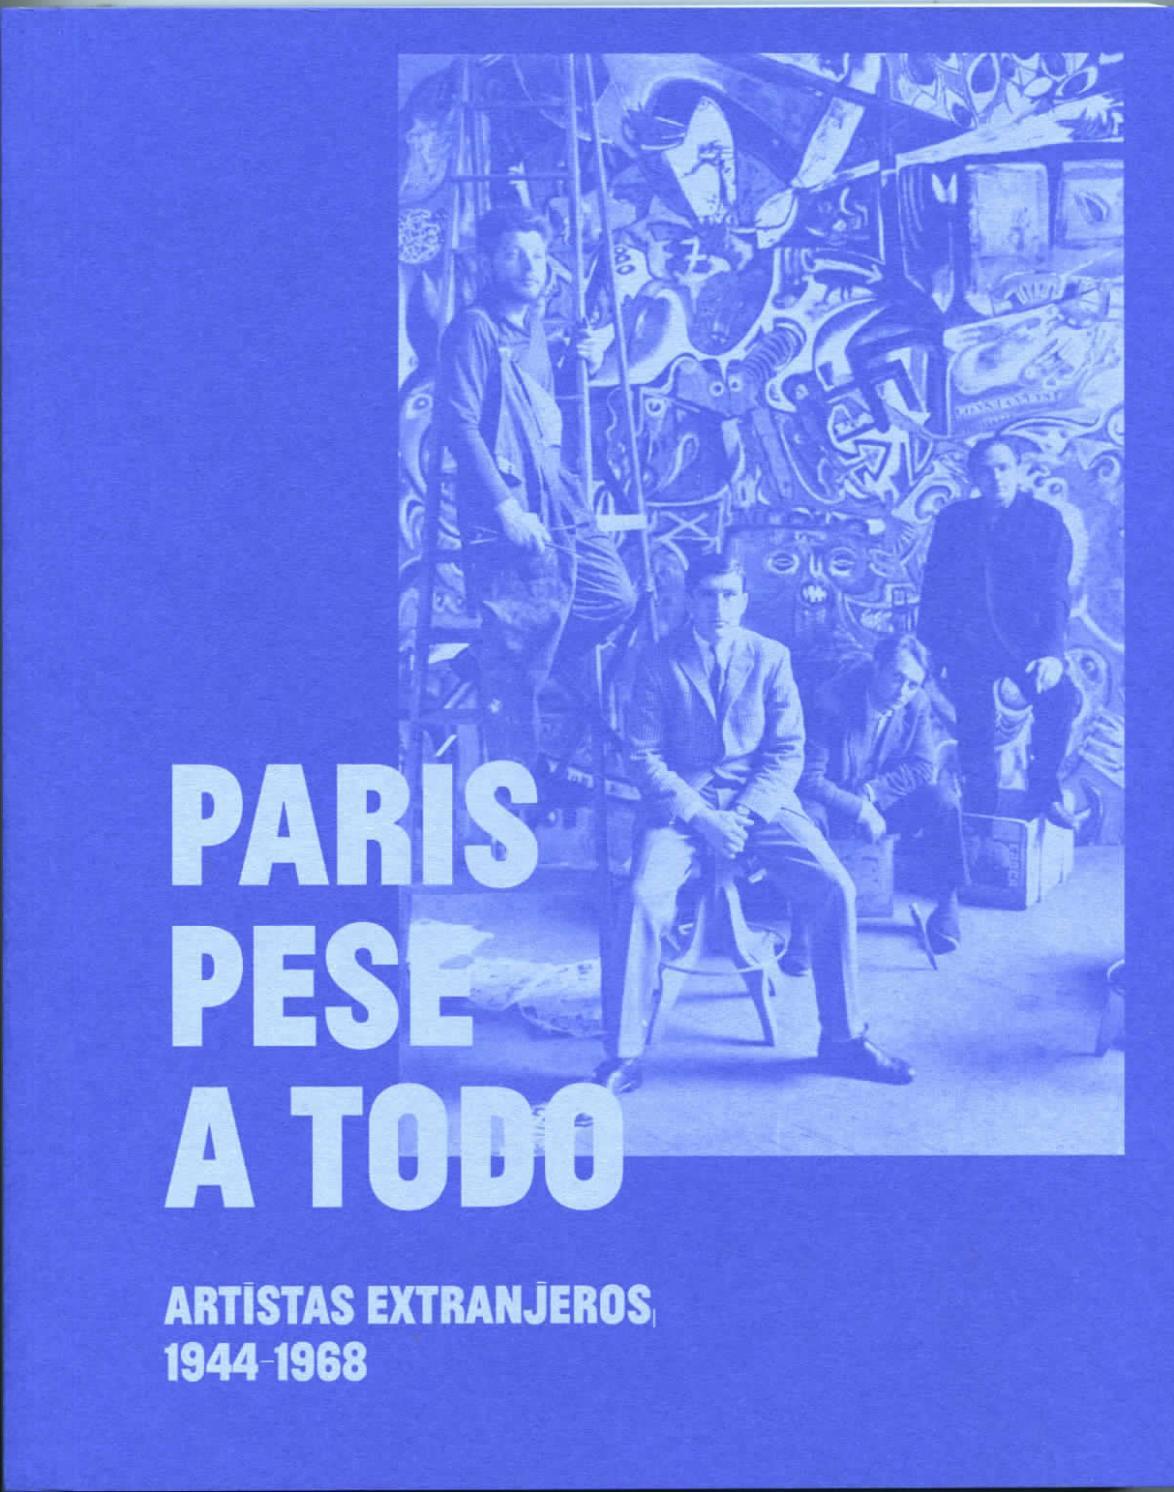 París pese a todo by Museo Reina Sofía - issuu